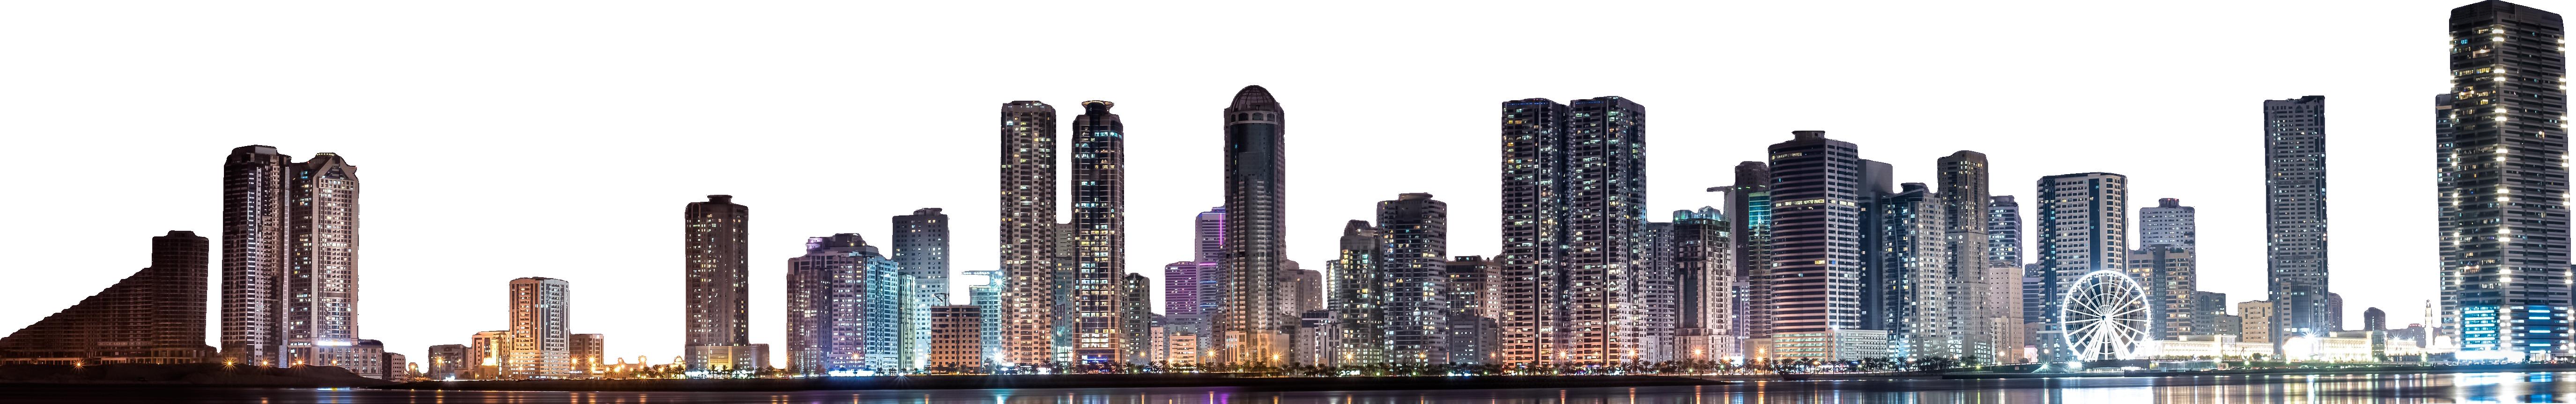 Skyline Wide Night PNG Image